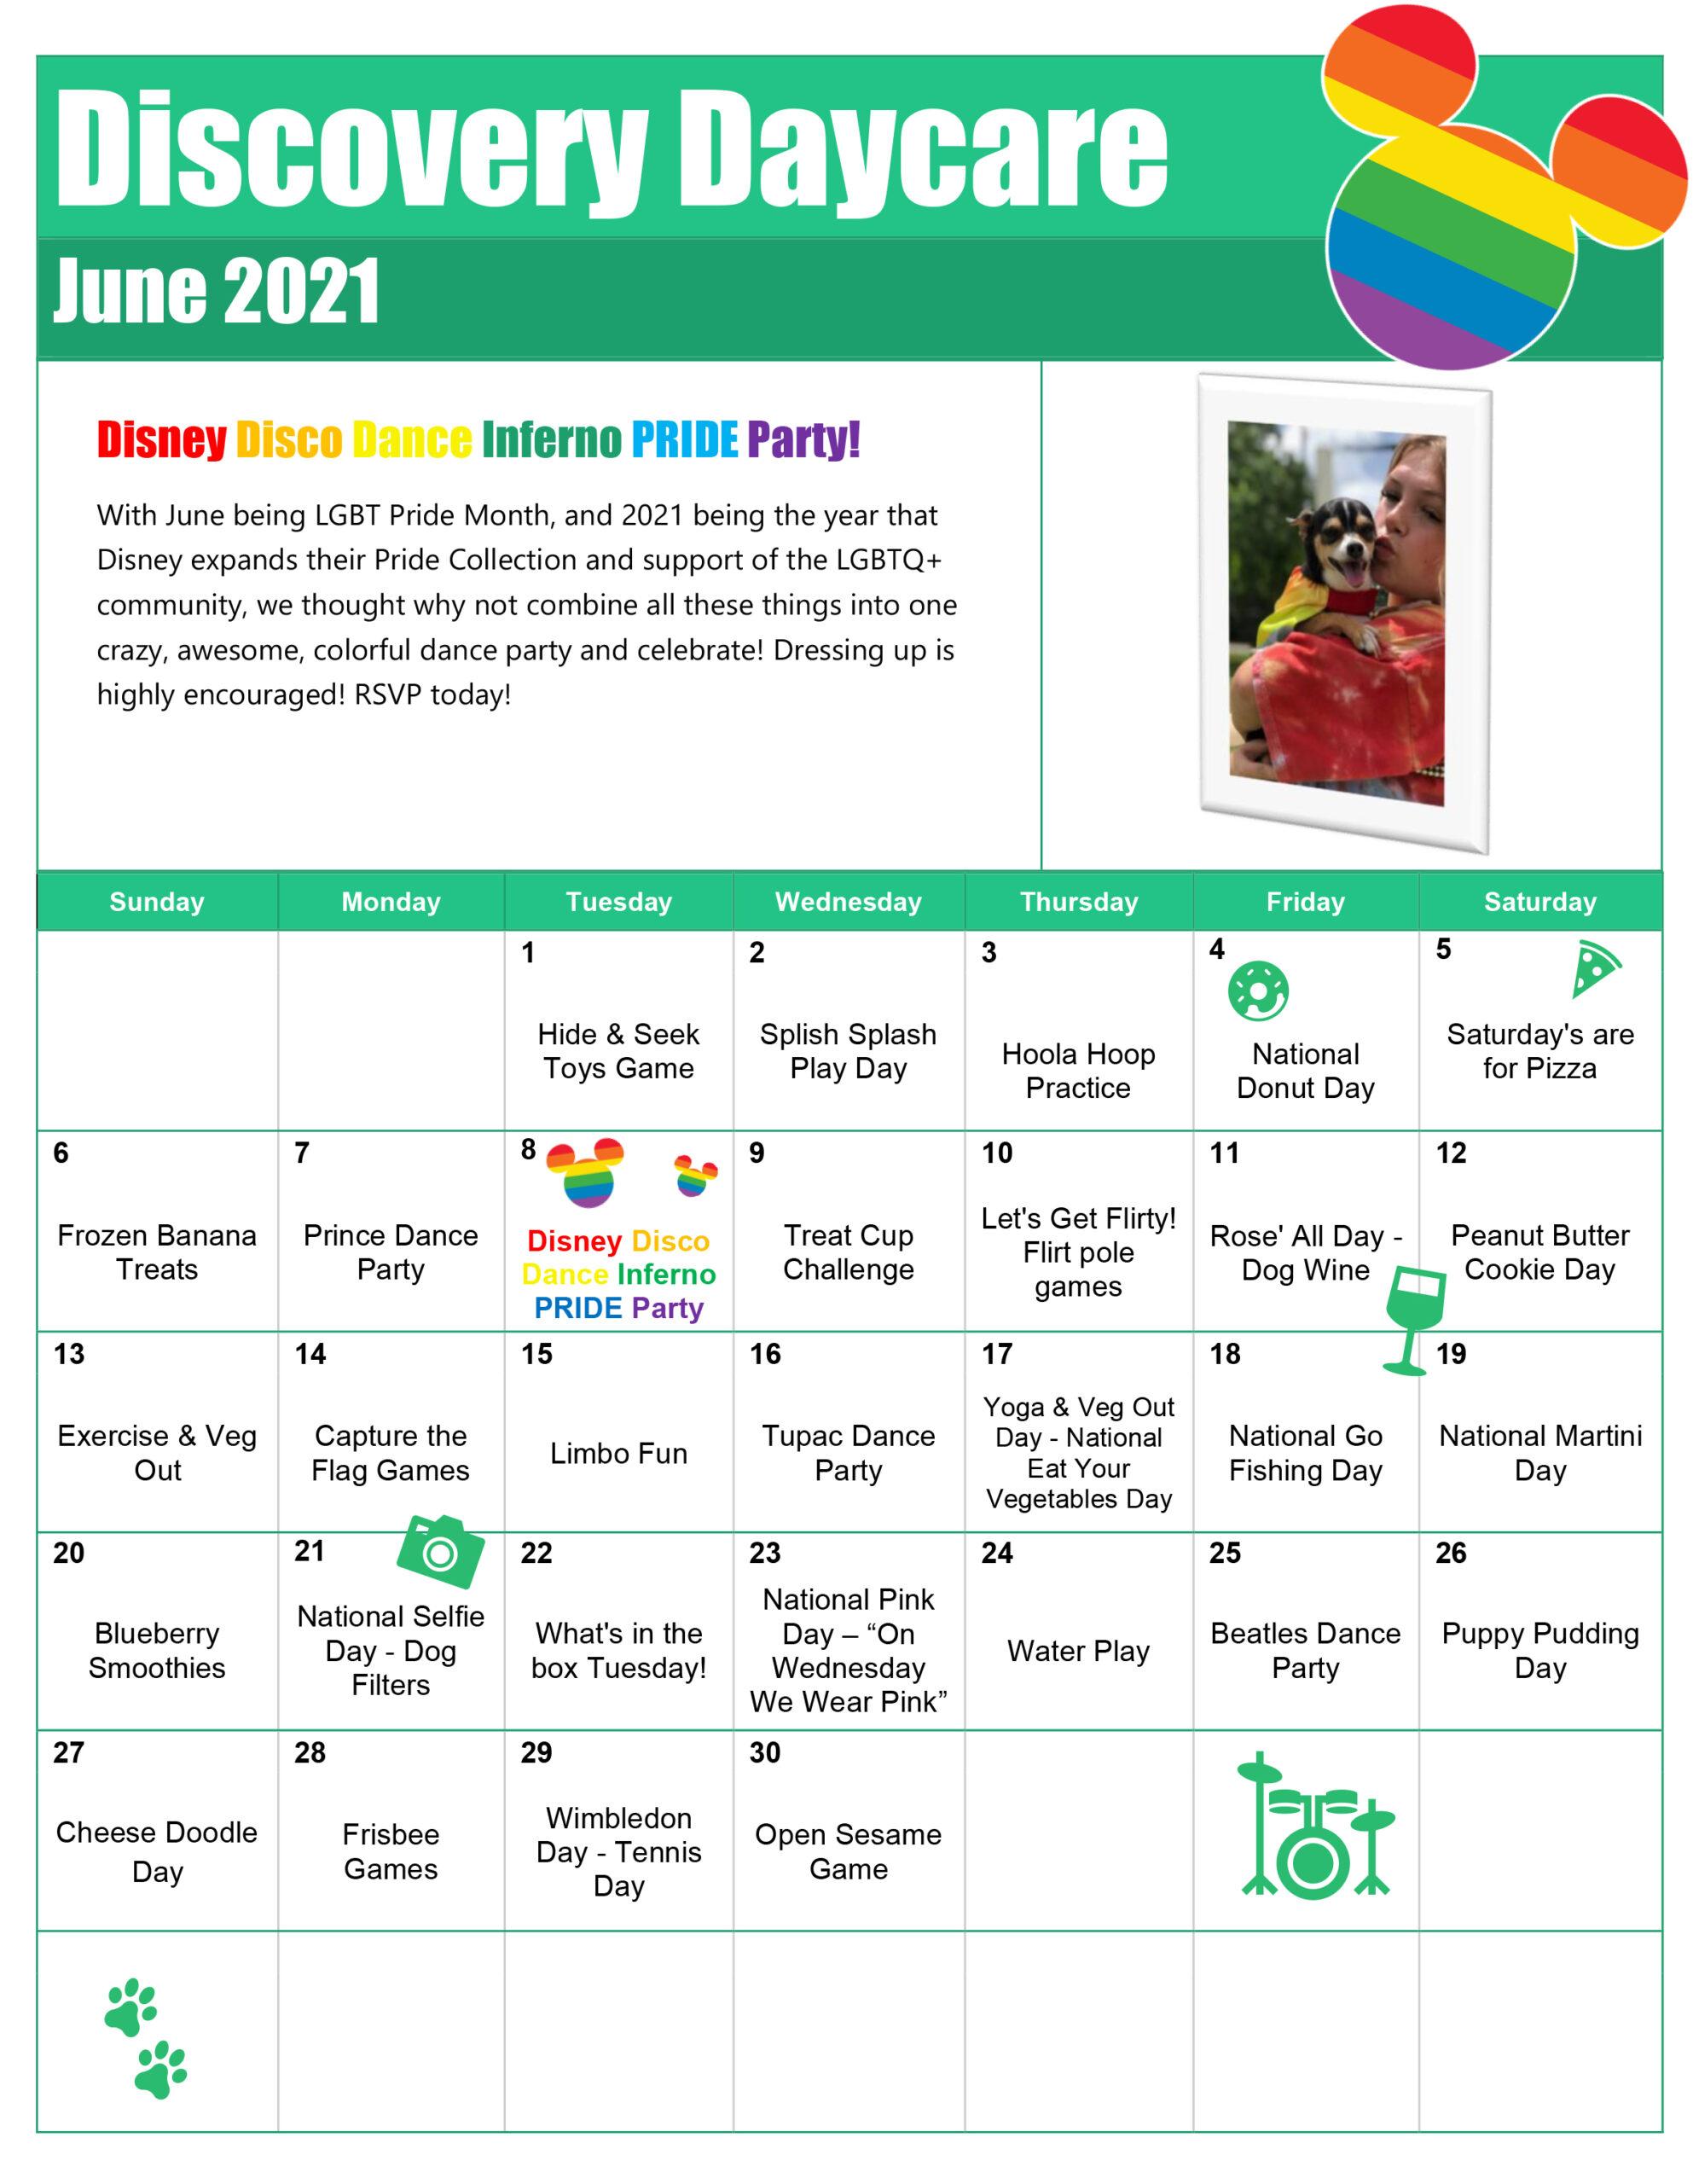 June Discovery Daycare Calendar 2021-1